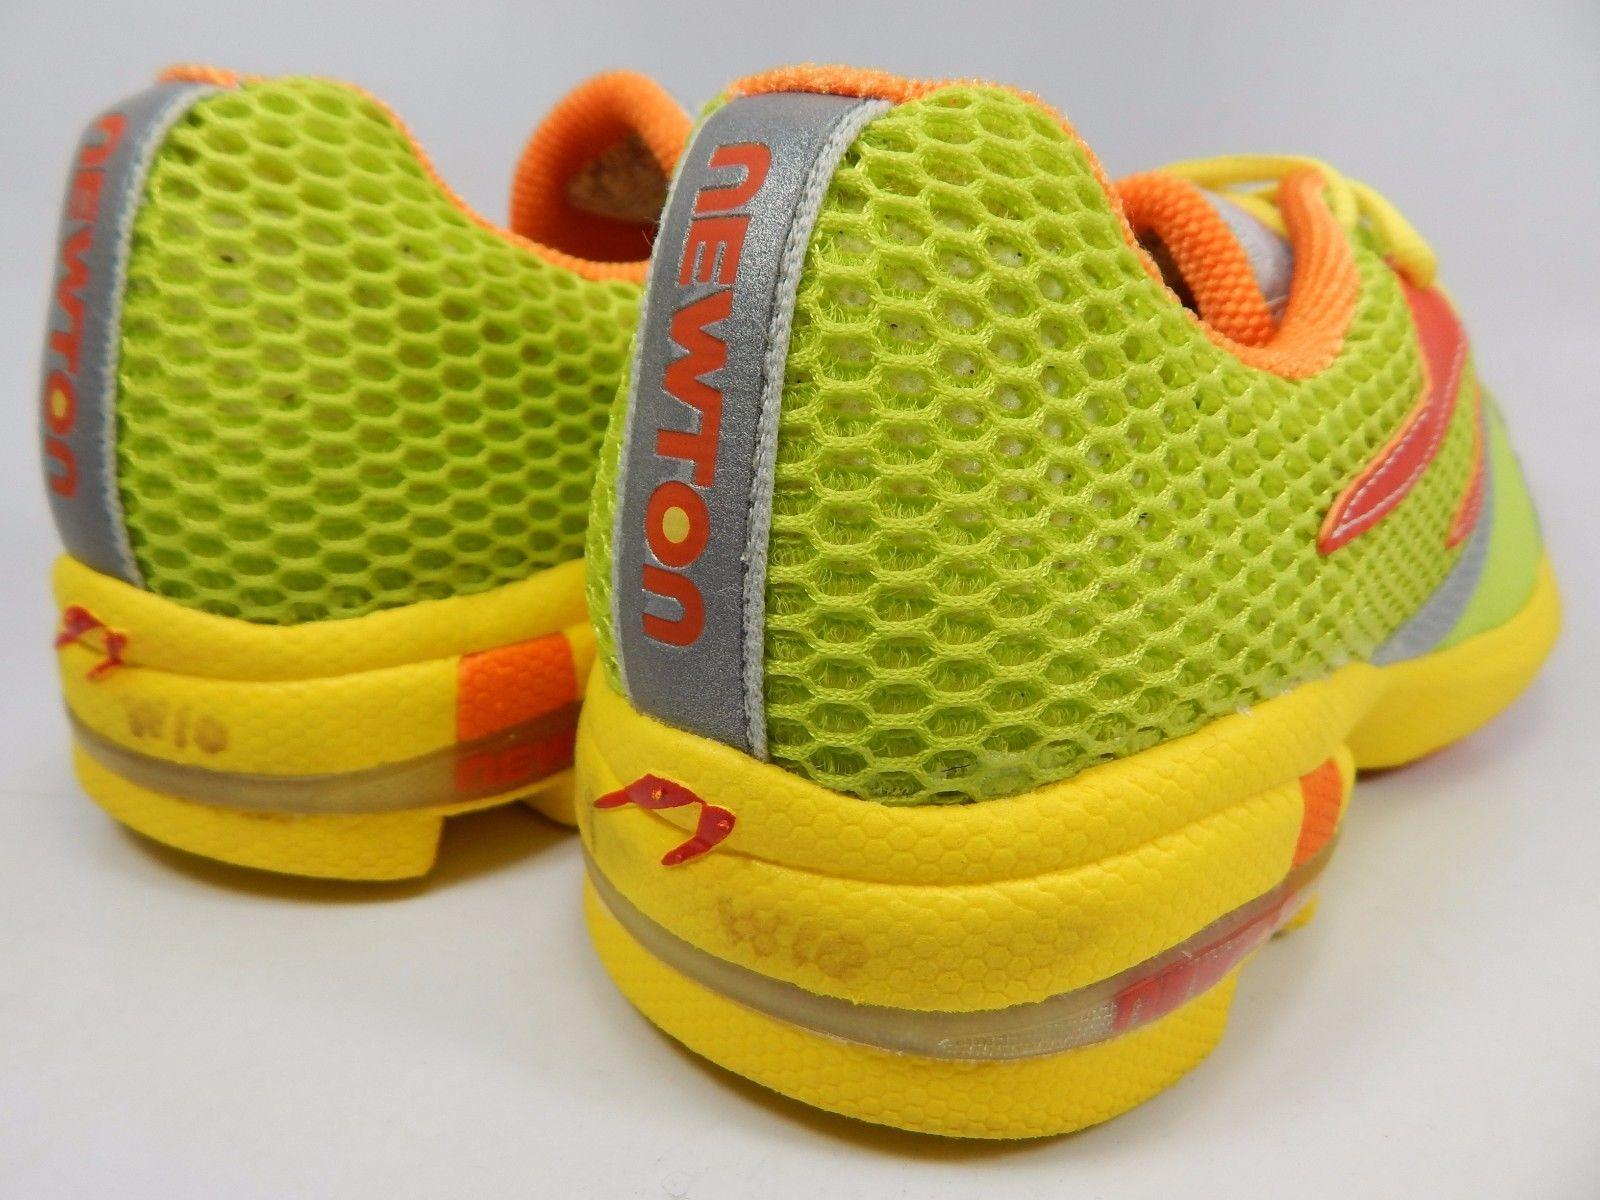 Newton Distance Women's Running Shoes Size US 10 M (B) EU 41.5 Green 00611